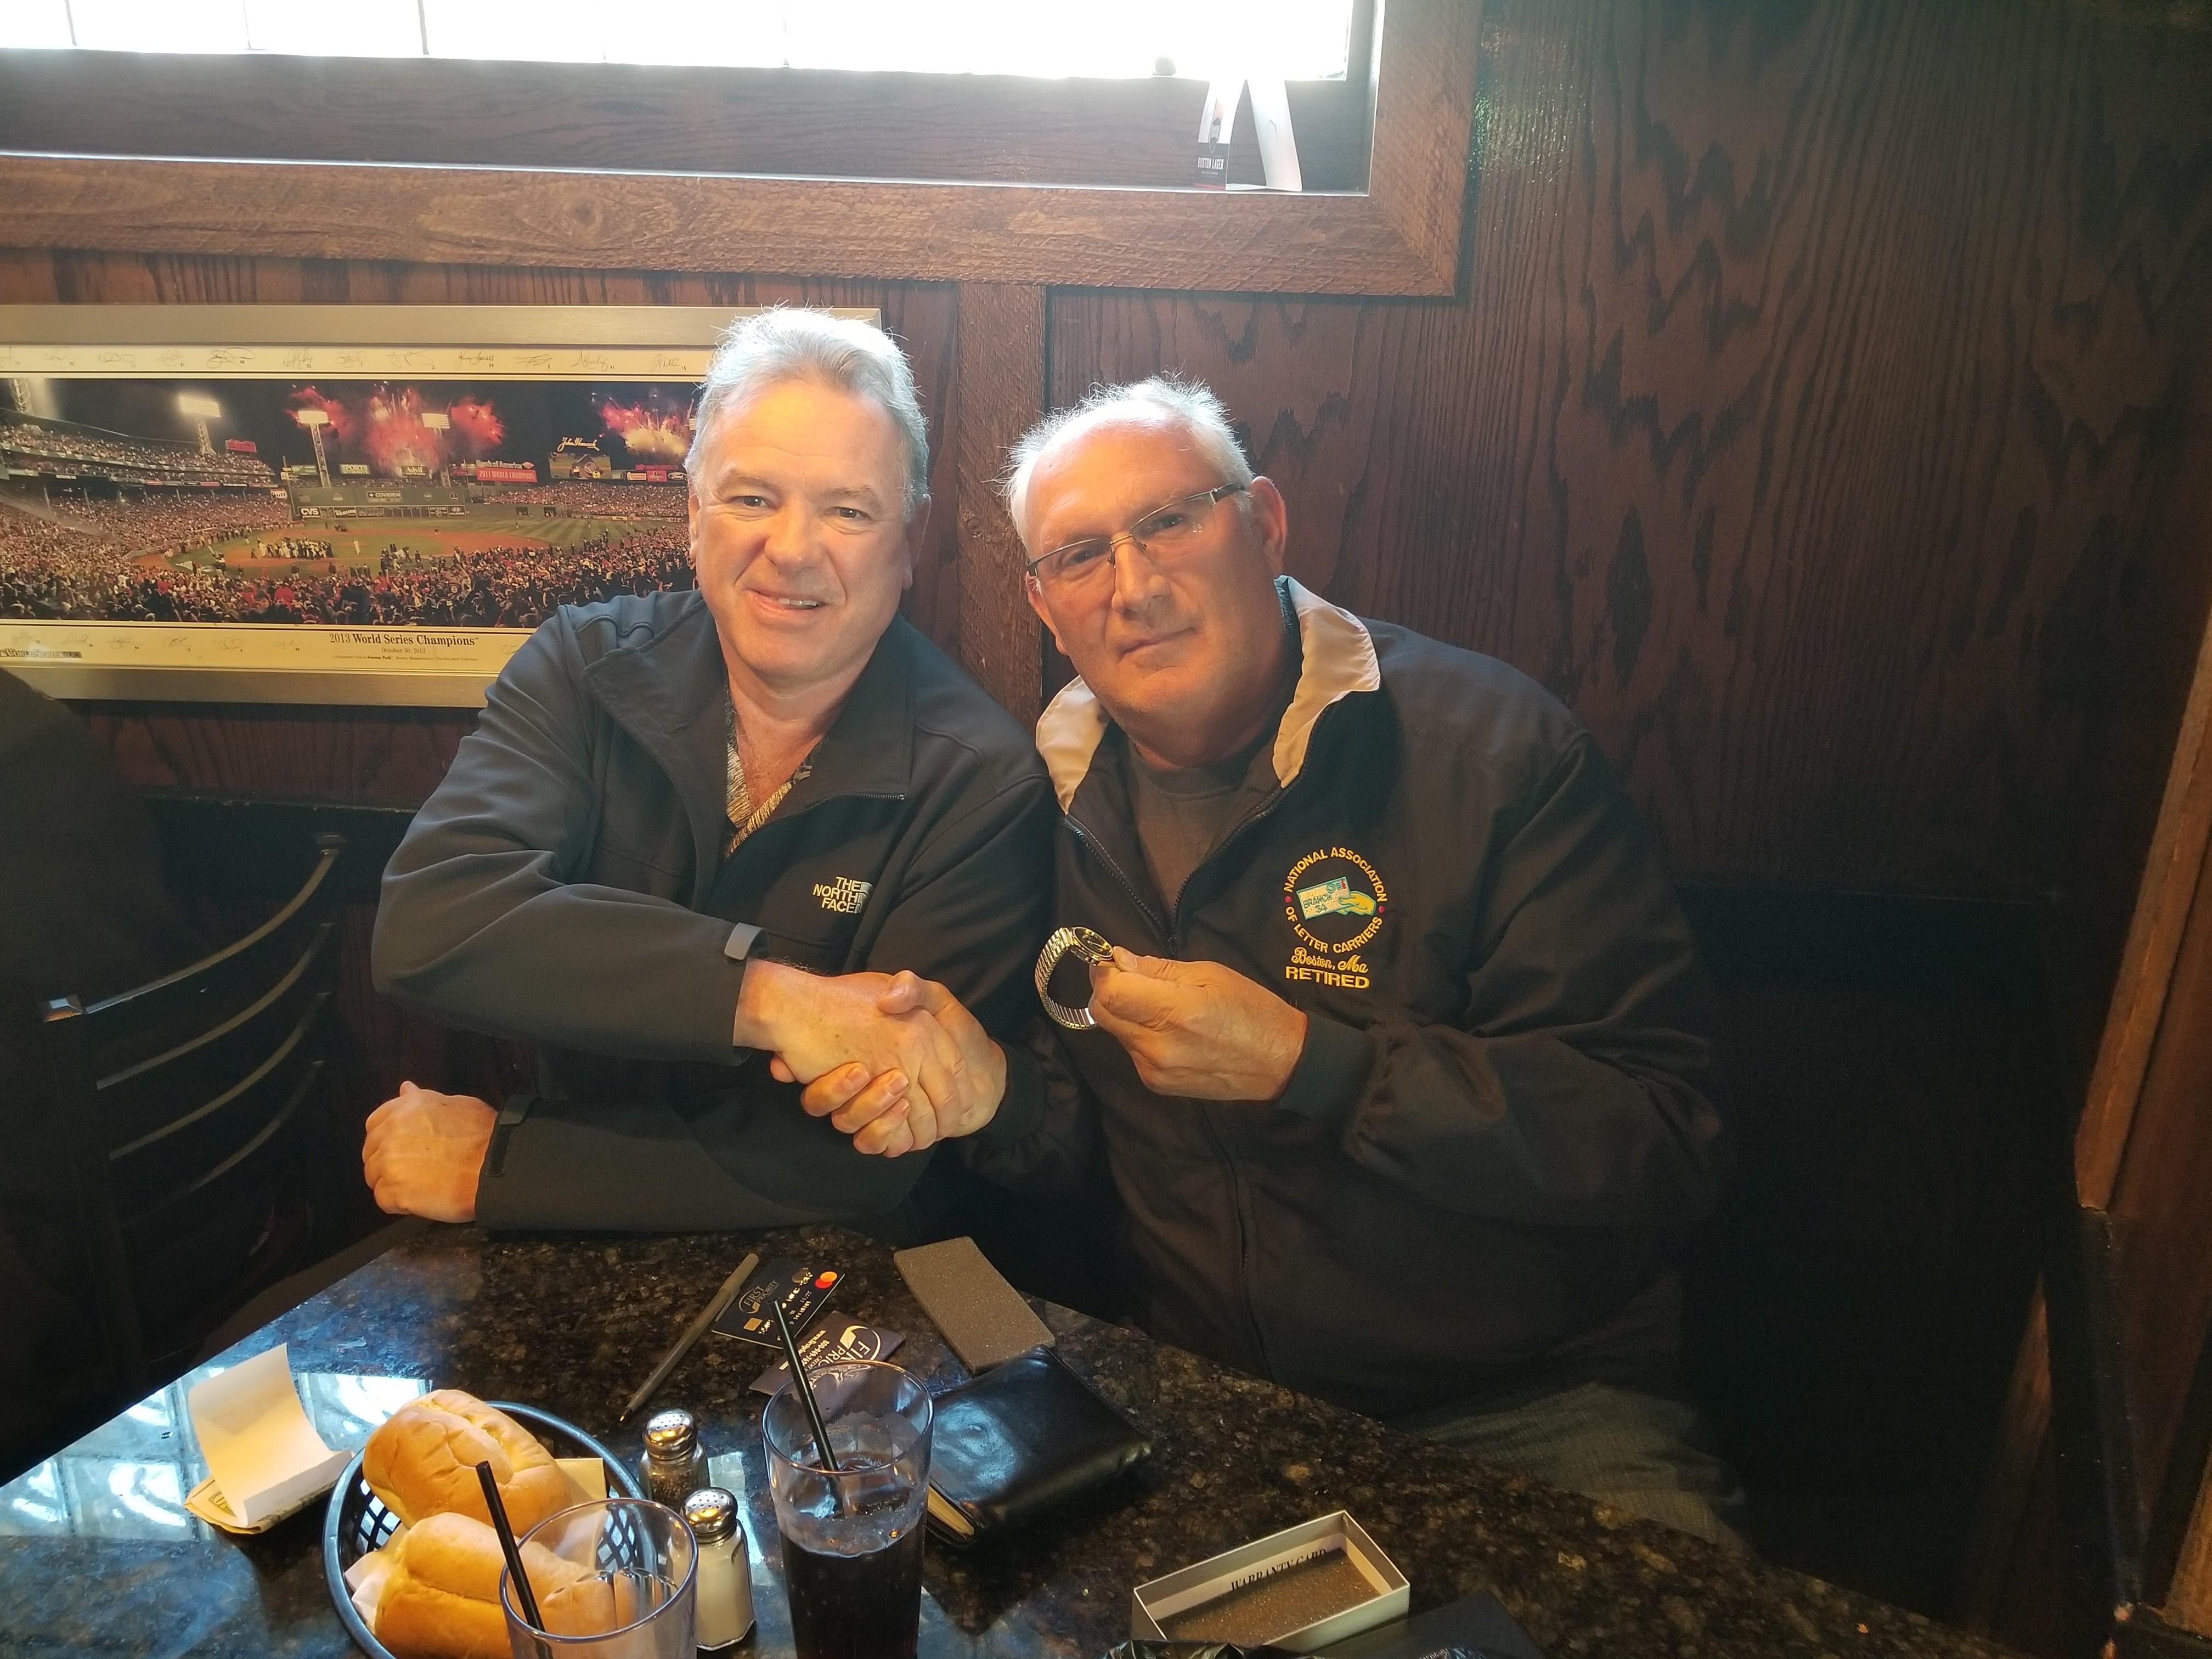 IMC Retiree Joe Dulcetta is congratulated by President Jerry McCarthy